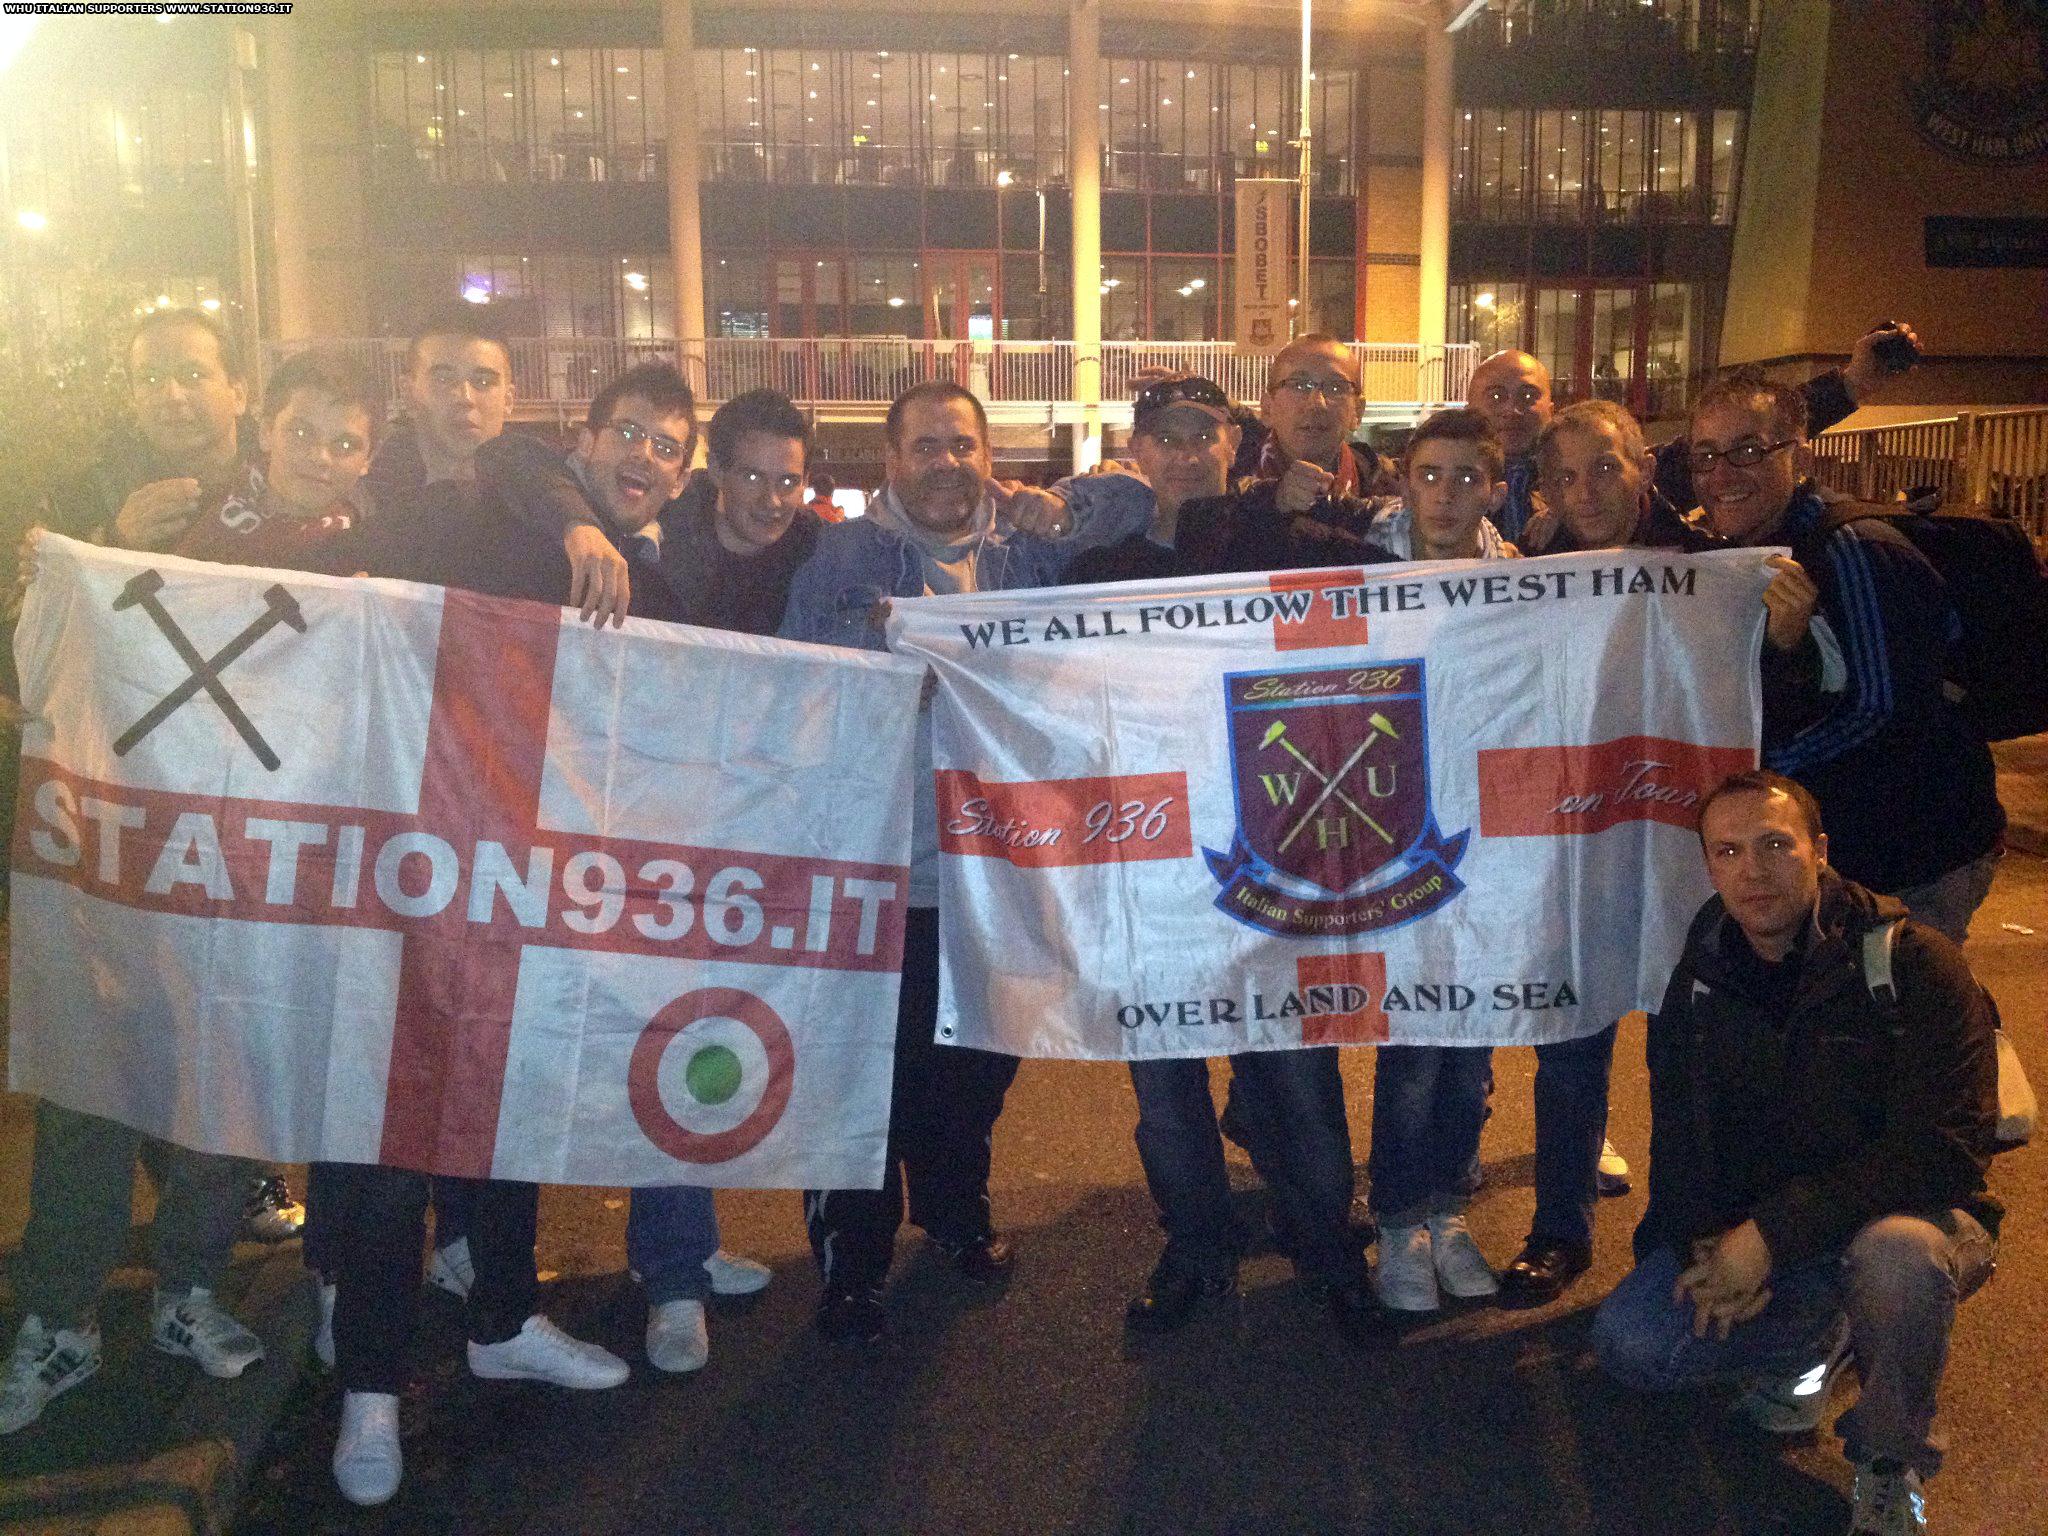 Alcuni della Station 936 davanti al Boleyn Ground stadium